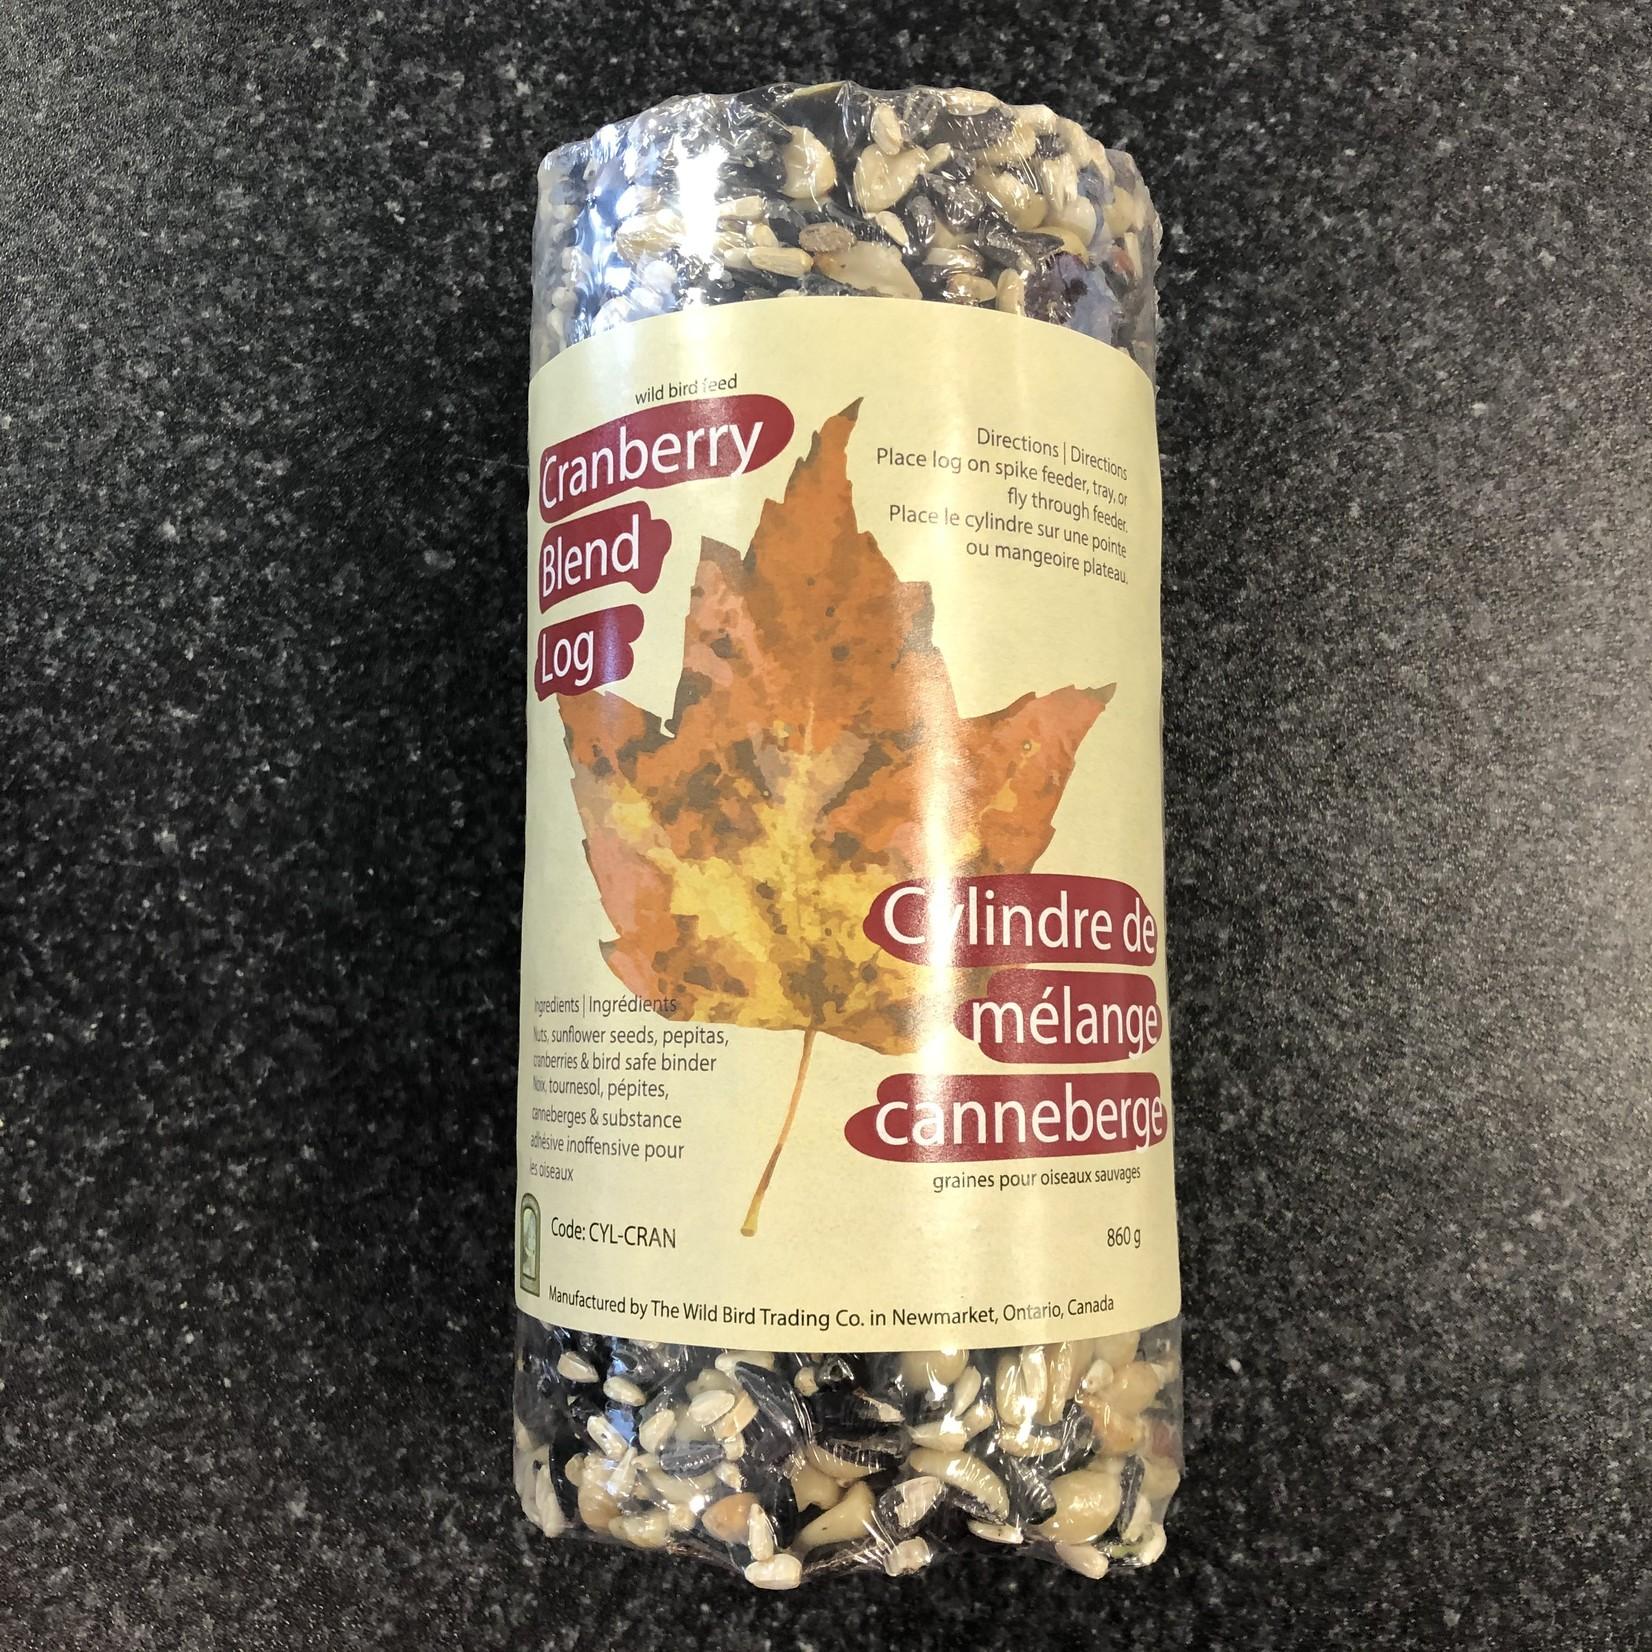 Seed Log - Cranberry